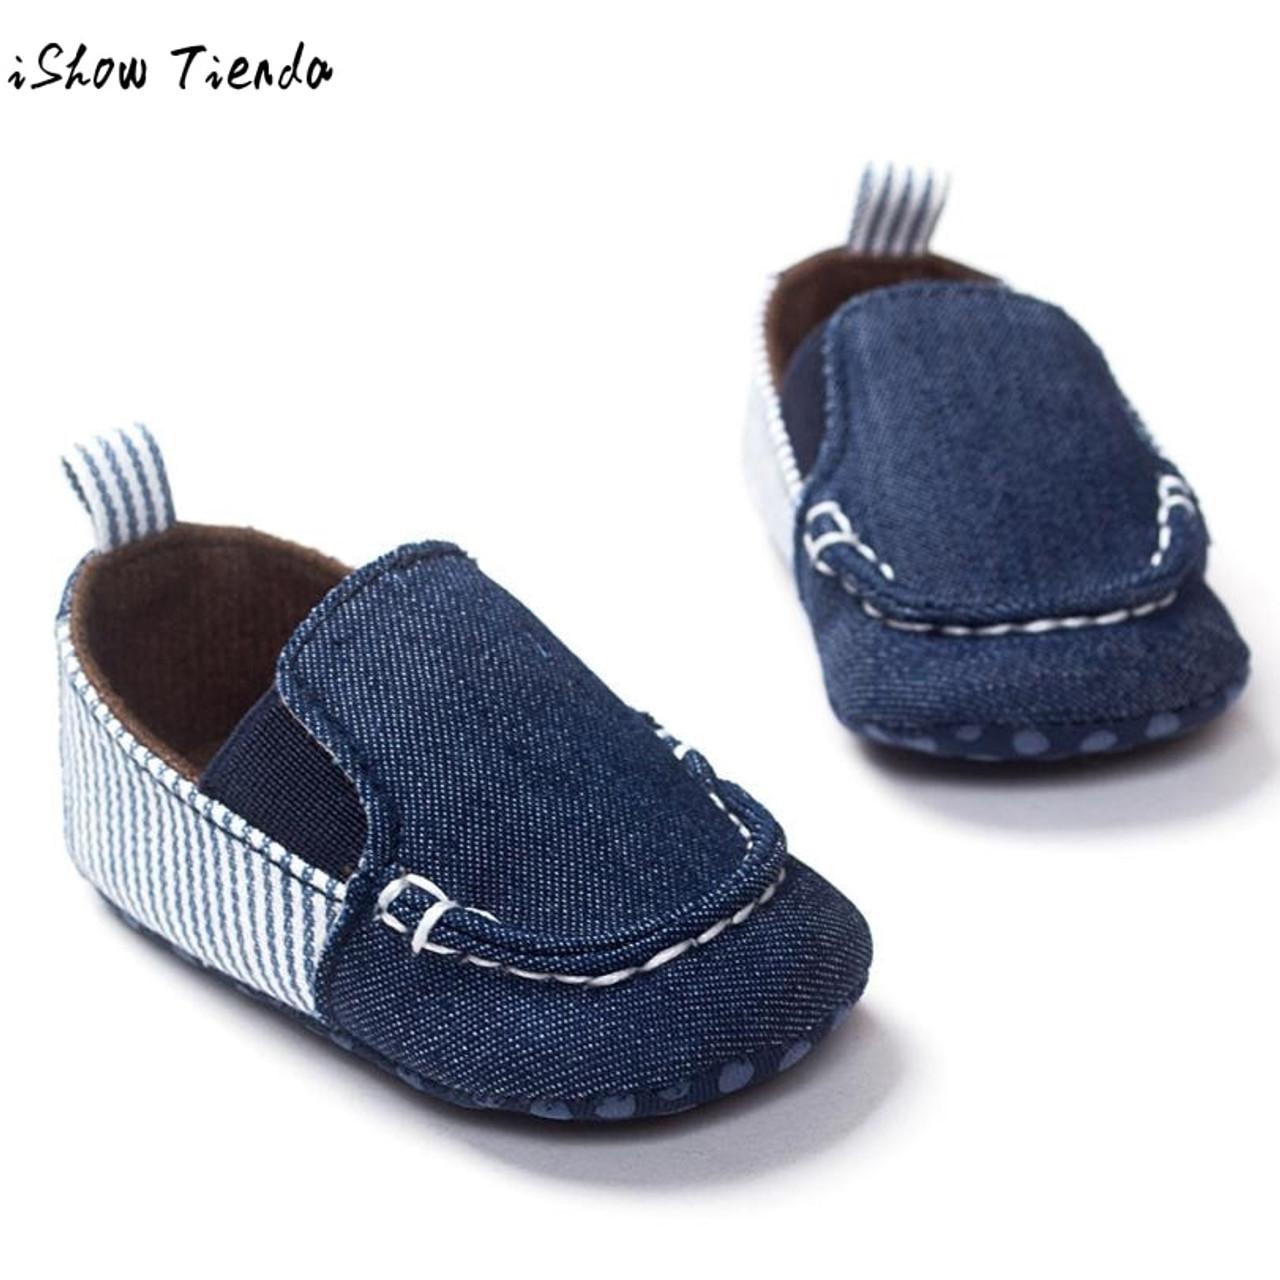 ROMIRUS Baby Boy Shoes Slip-on Blue